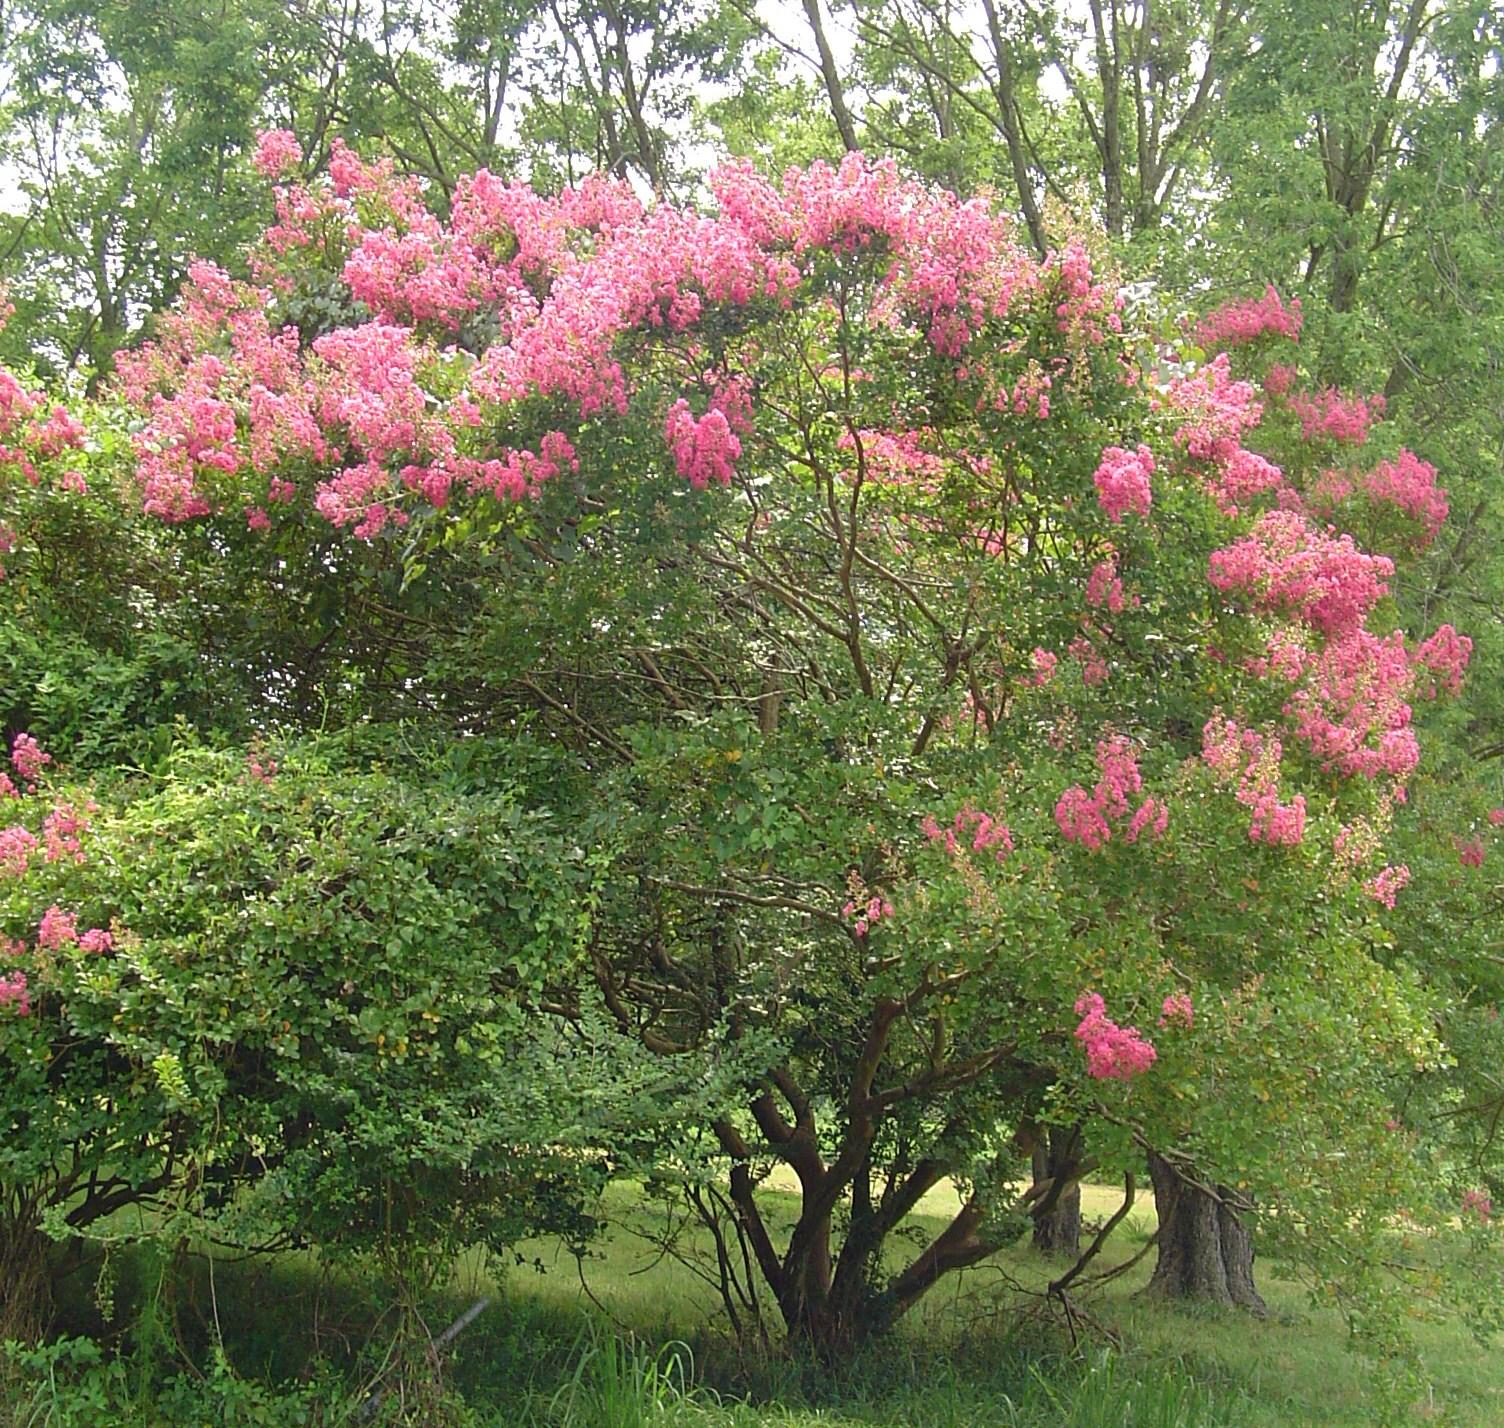 Crepe Myrtle: One Hundred Days of Flowers | Forest Garden